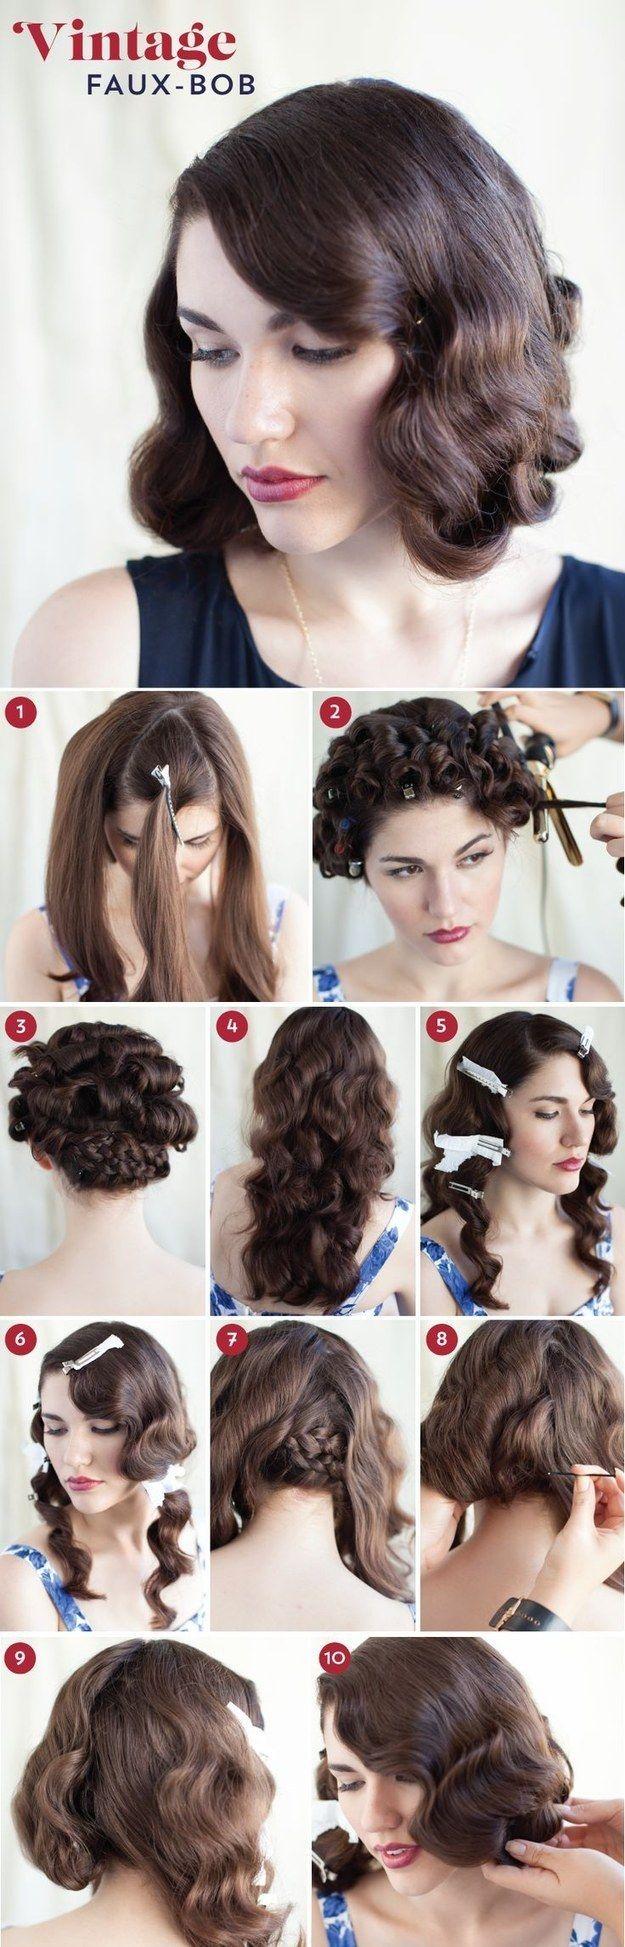 30 DIY Vintage Hairstyle Tutorials for Short, Medium, Long Hair